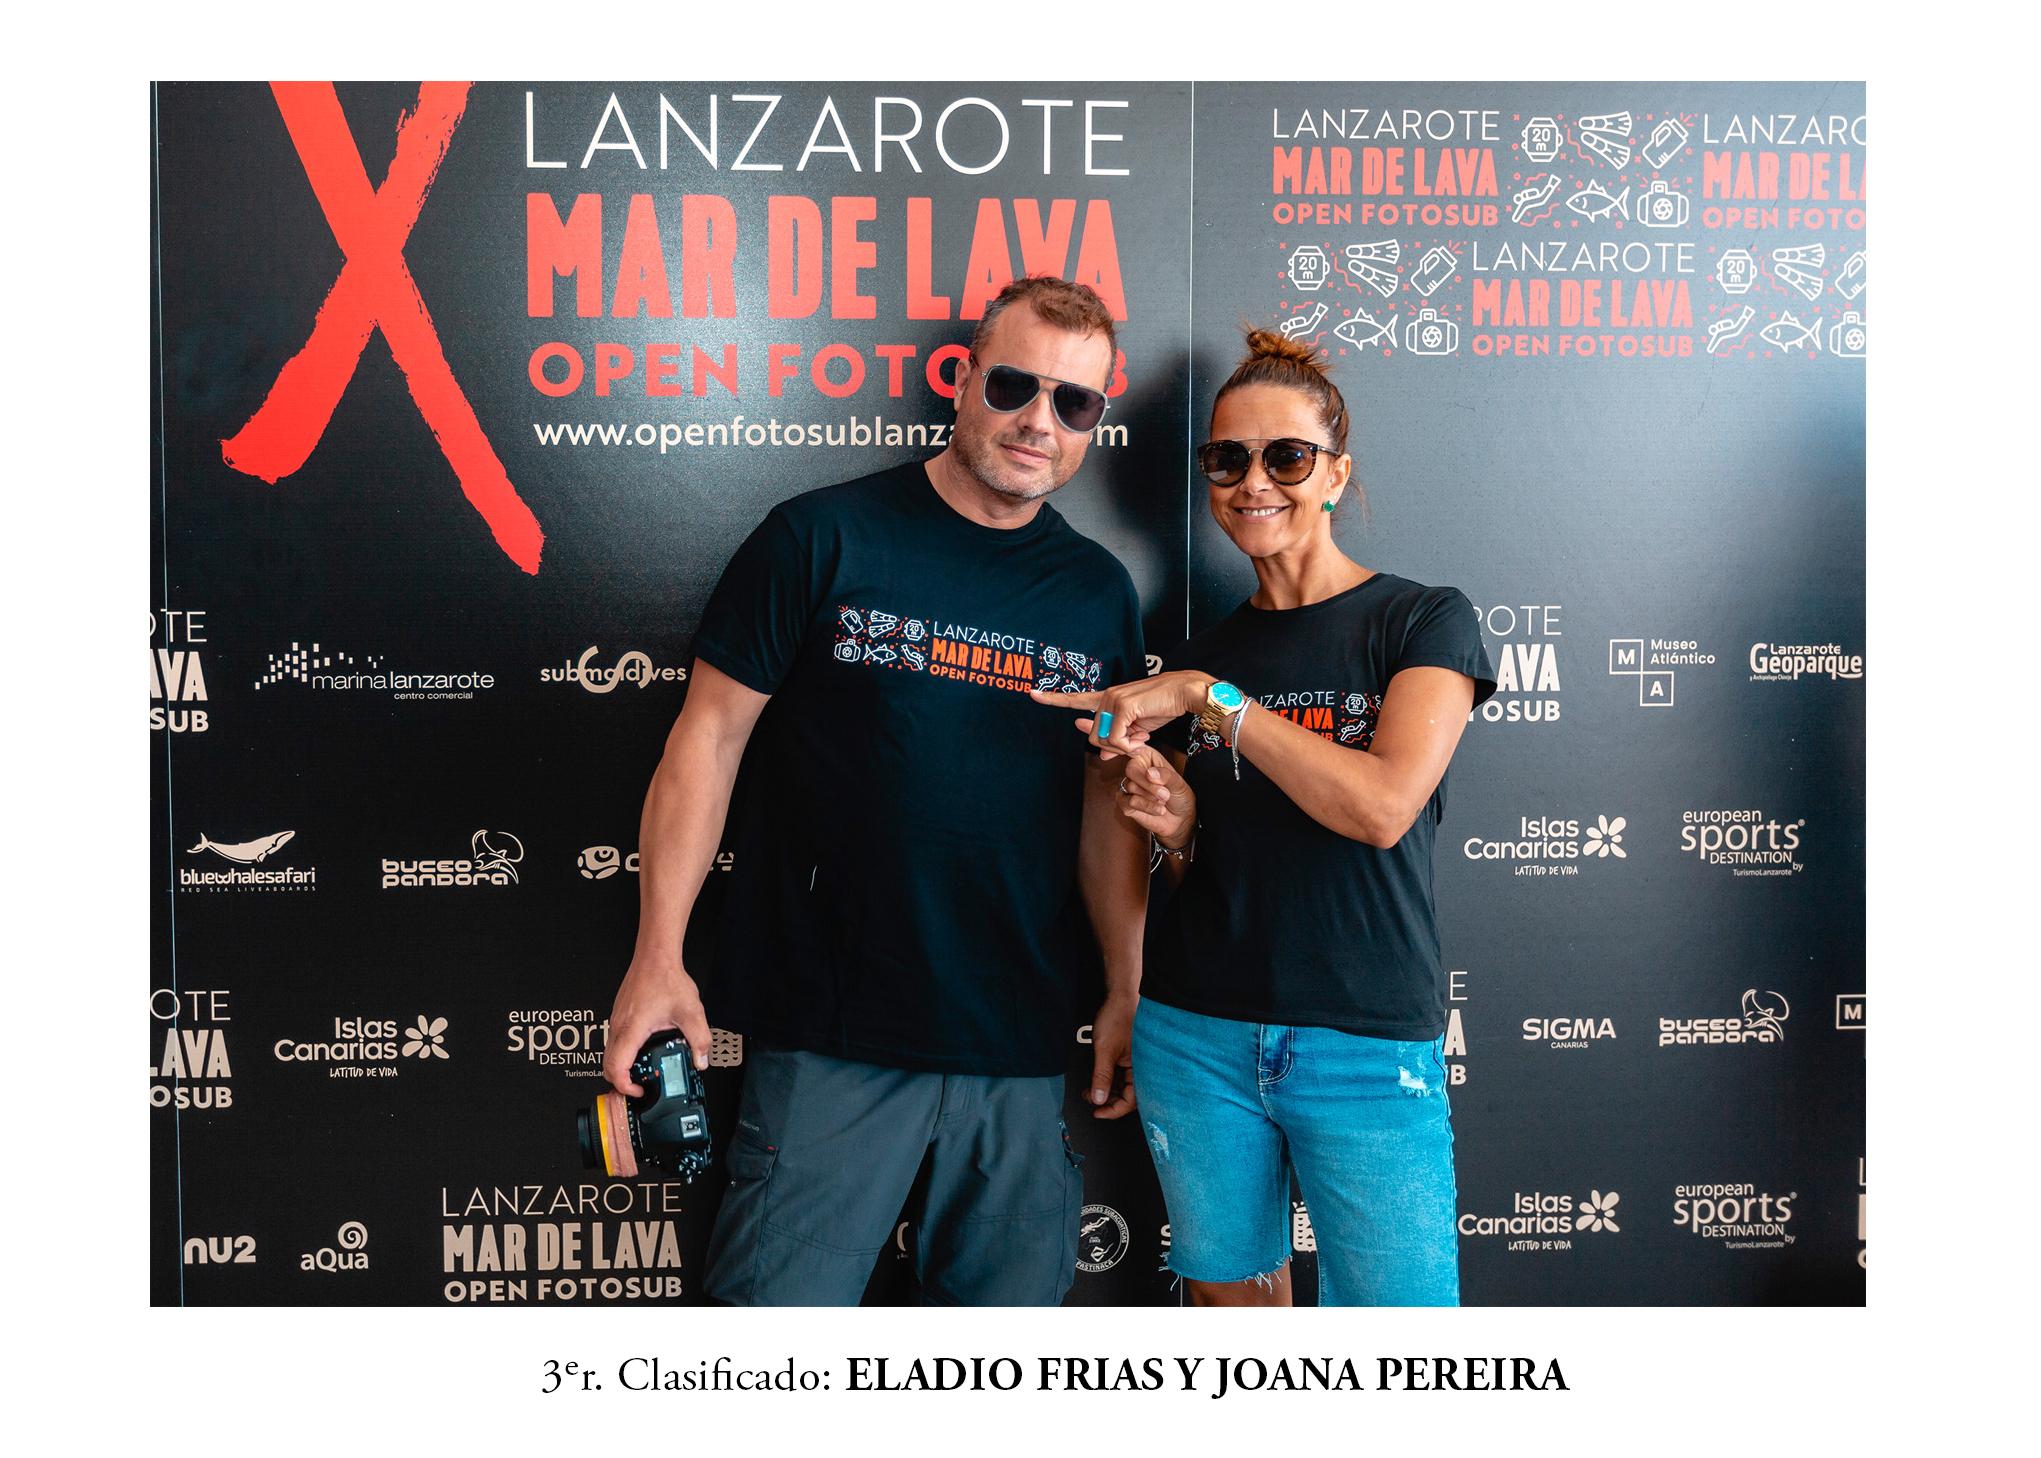 ELADIO FRIAS Y JOANA PEREIRA .jpg